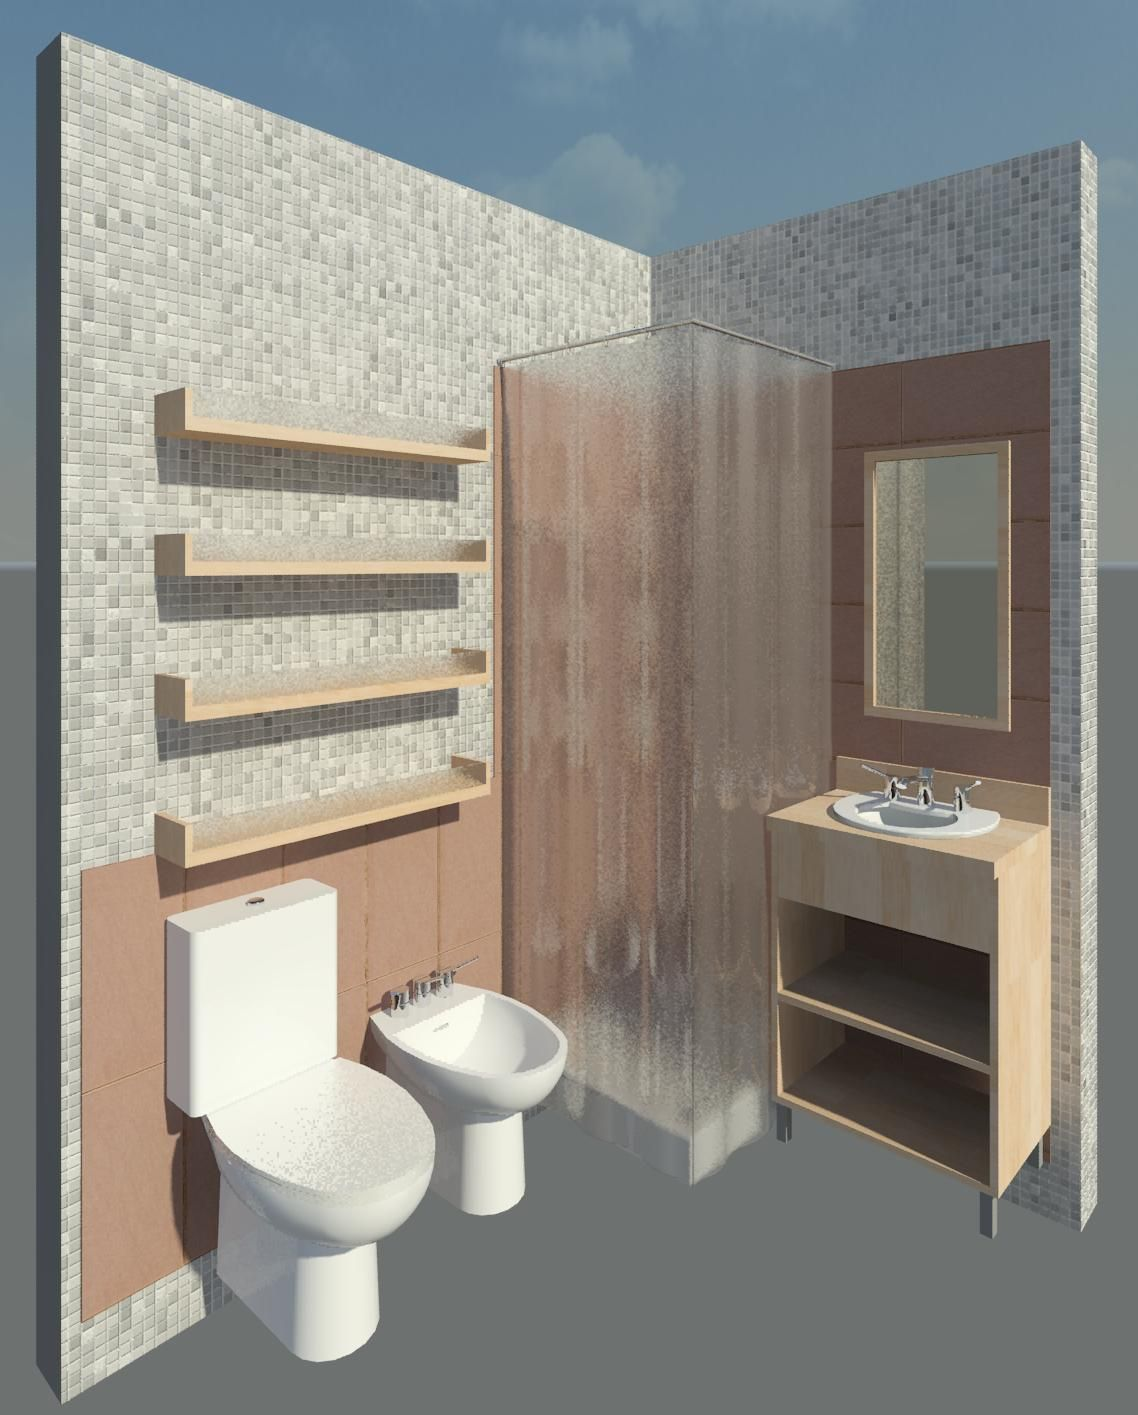 Revit Families For Architecture Revit Family Bathroom Furniture